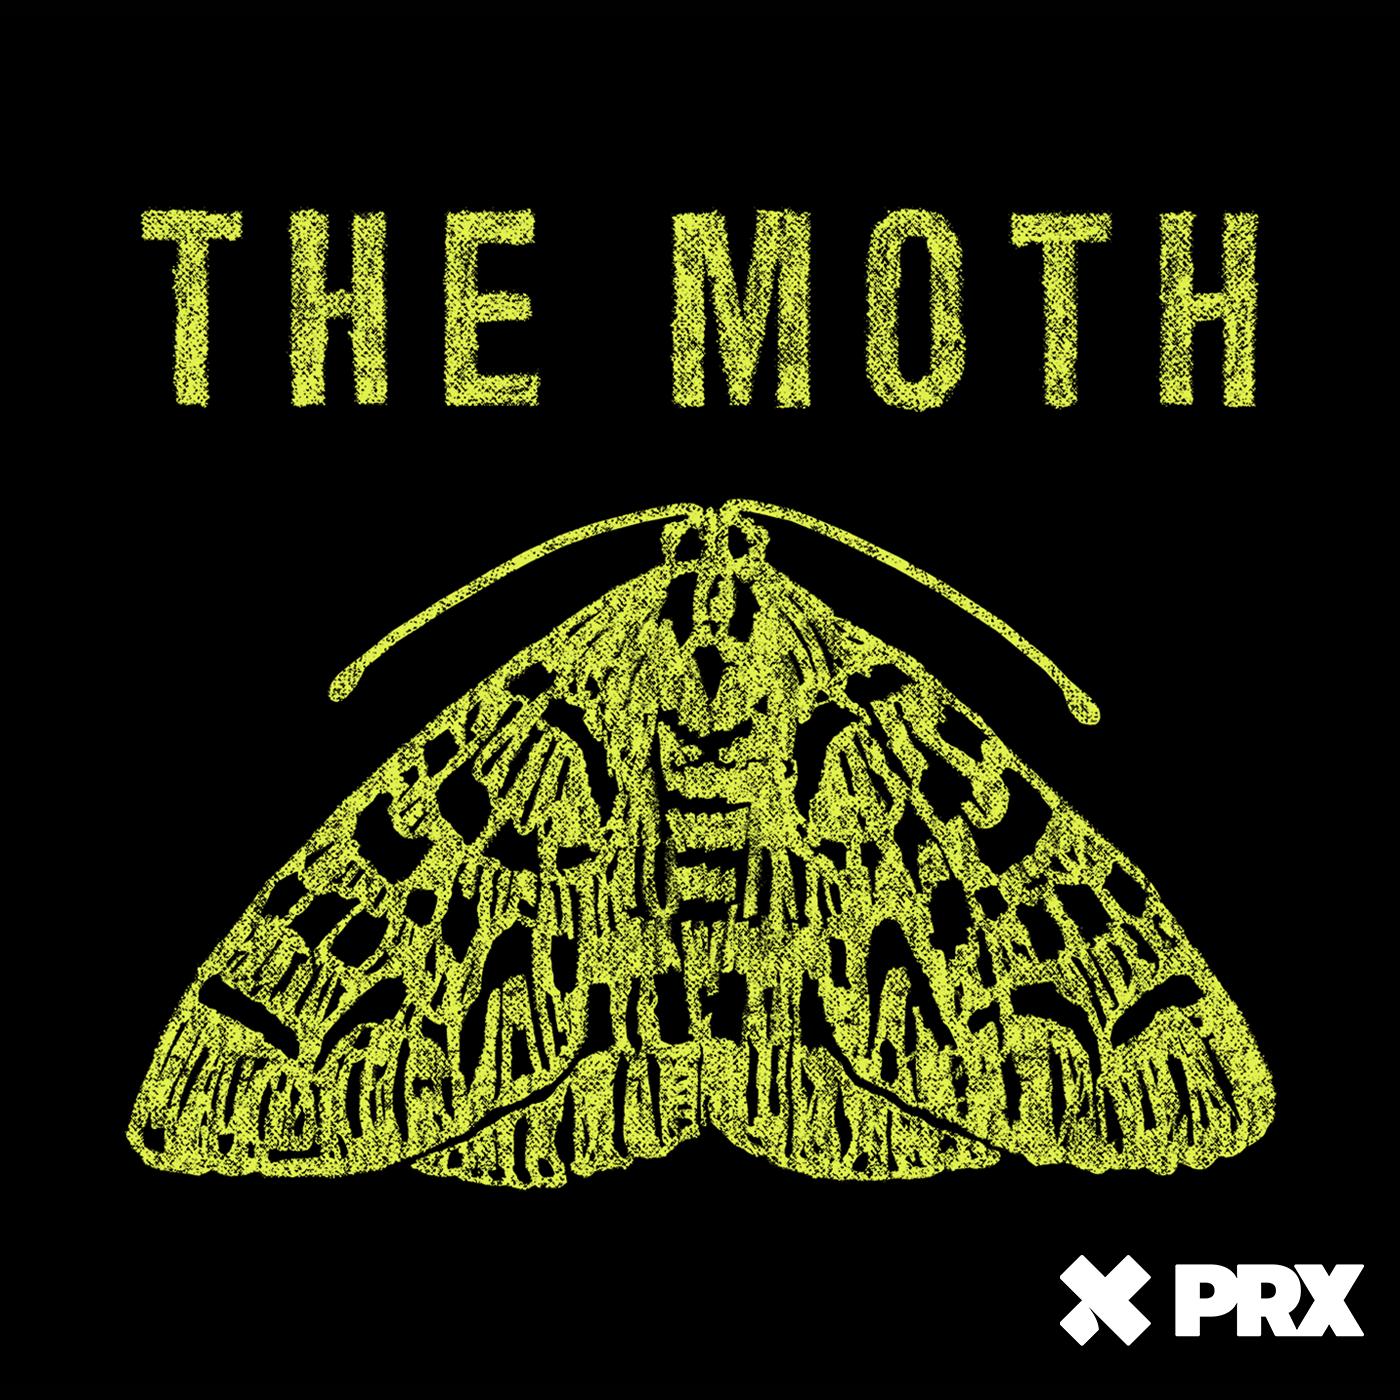 The Moth Radio Hour: Explorers, Organizers, and Interrogations